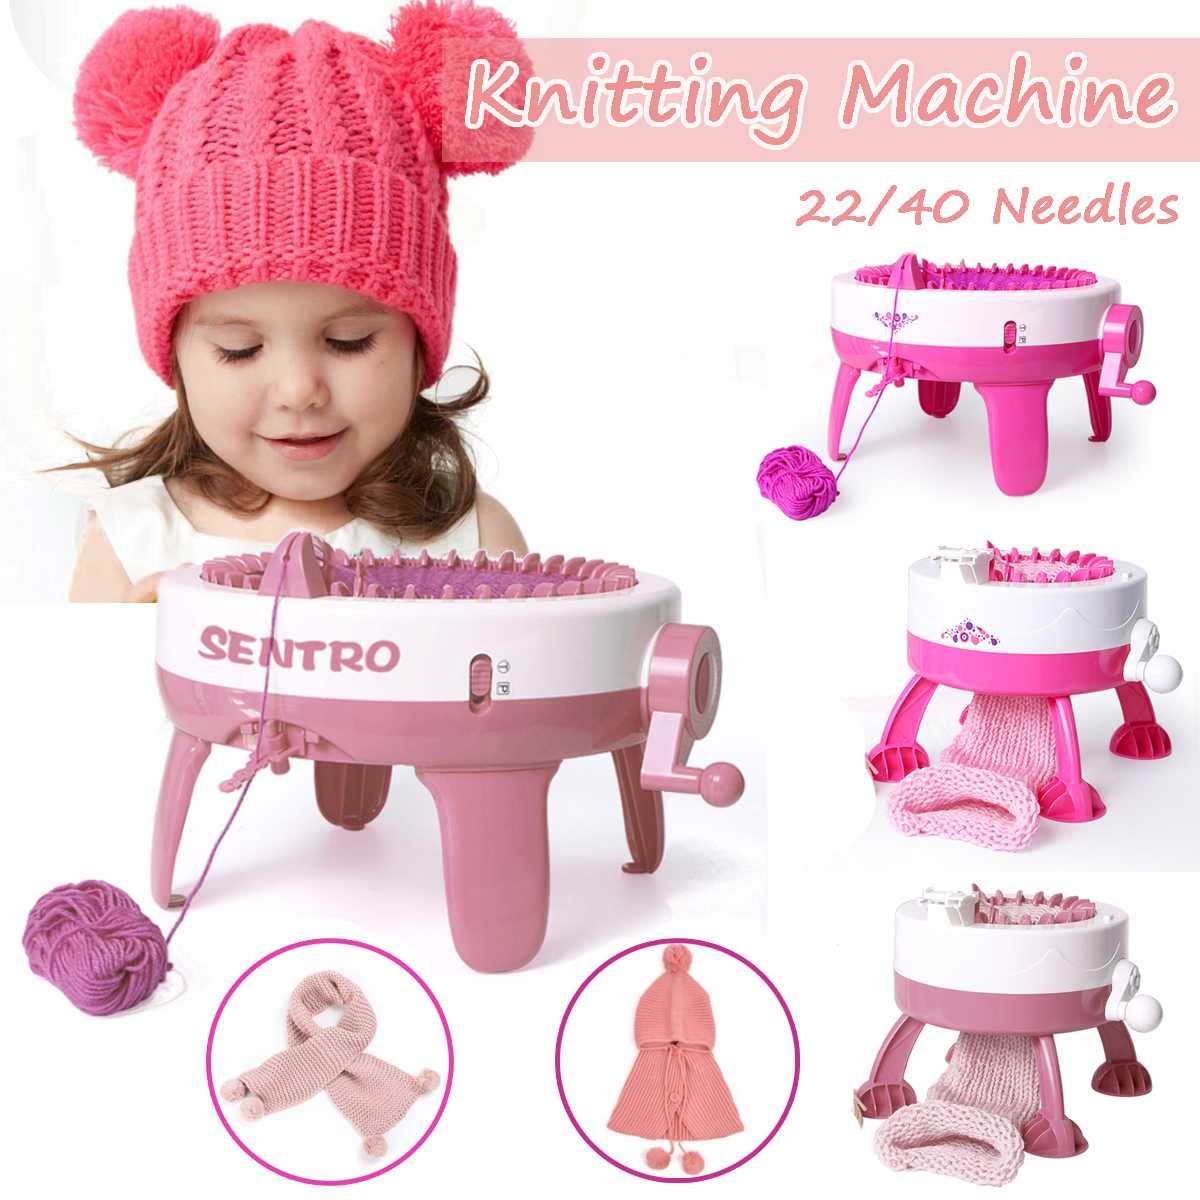 Kids Knitting Machine Mini Children Weaving Loom Knit For Hats Scarves Socks Toy